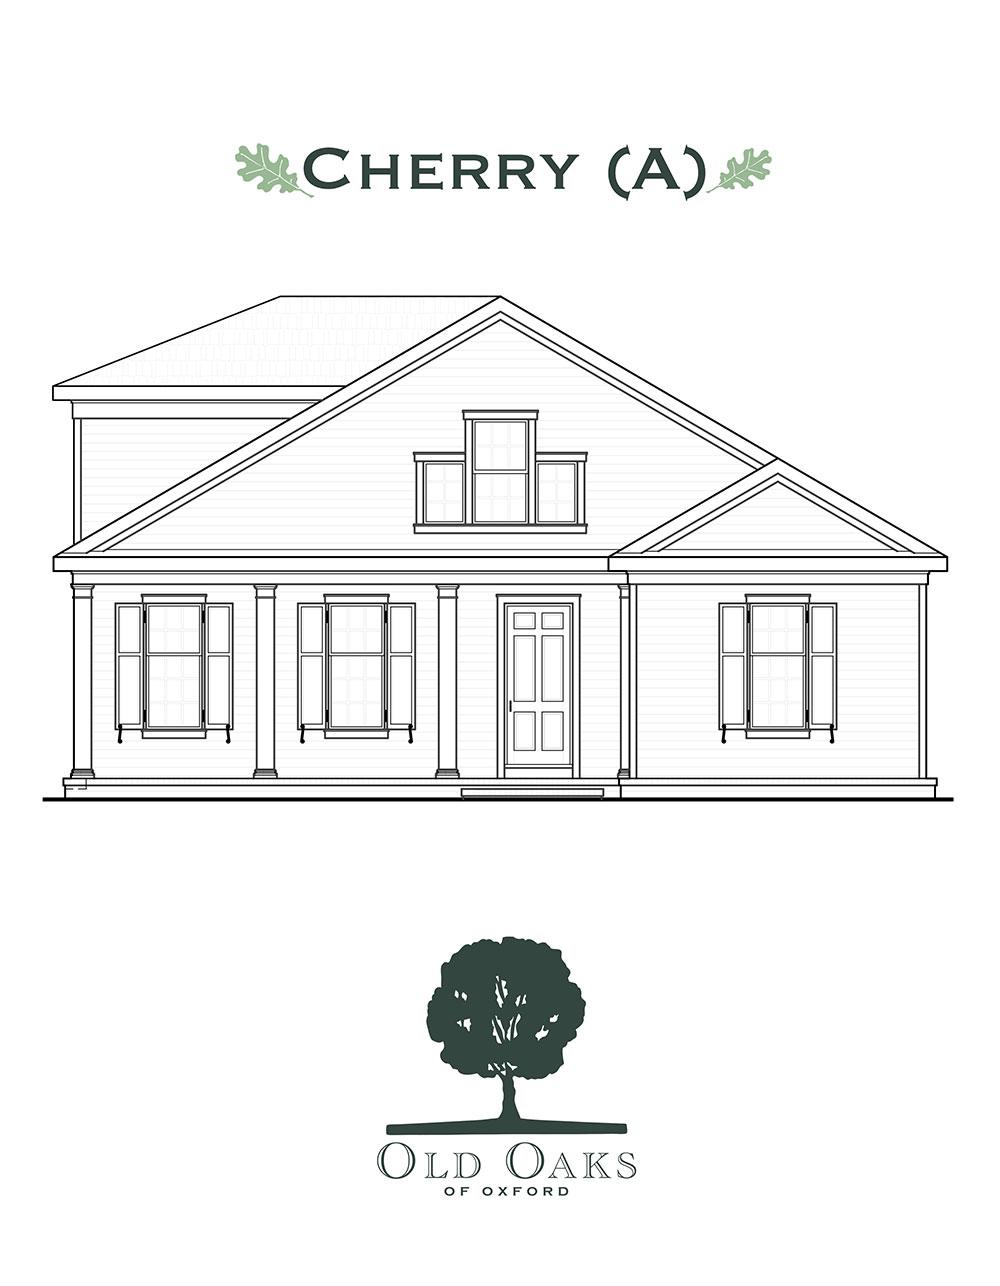 Cherry (A)